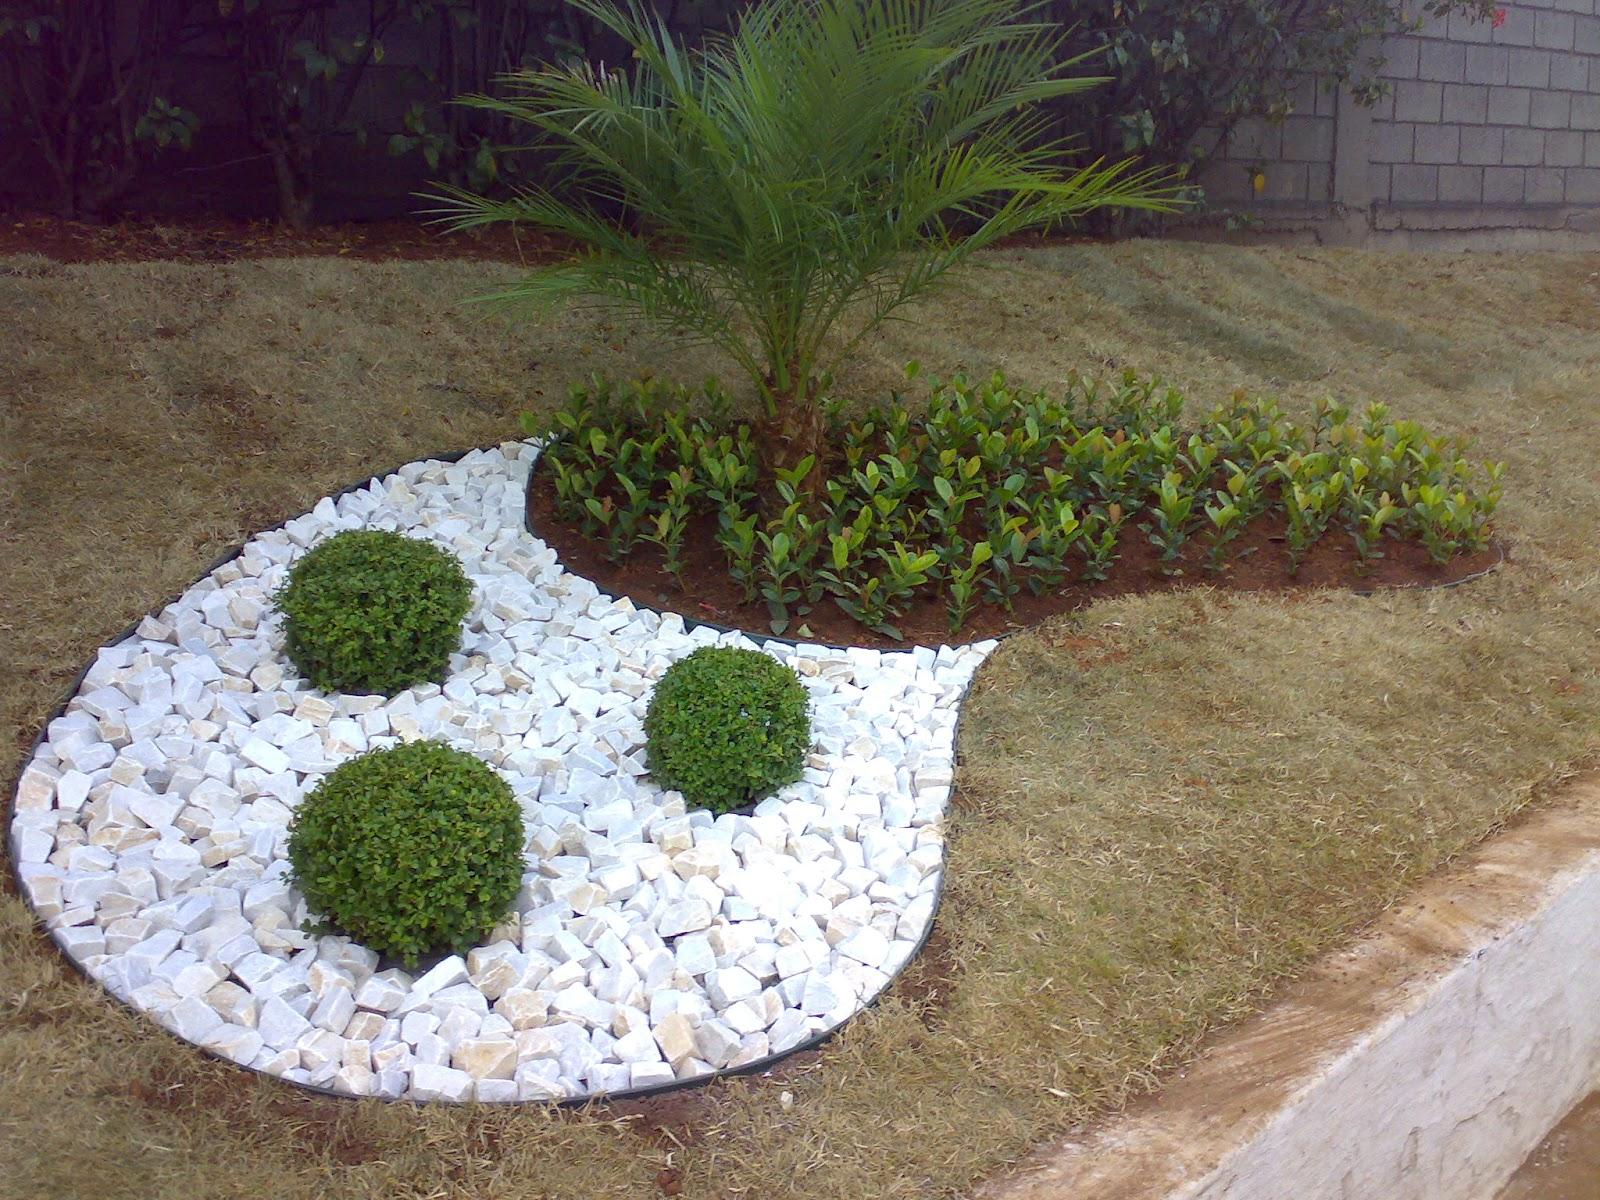 pedras de jardim branca : pedras de jardim branca:Jardinagem: Jardim daUnimetal